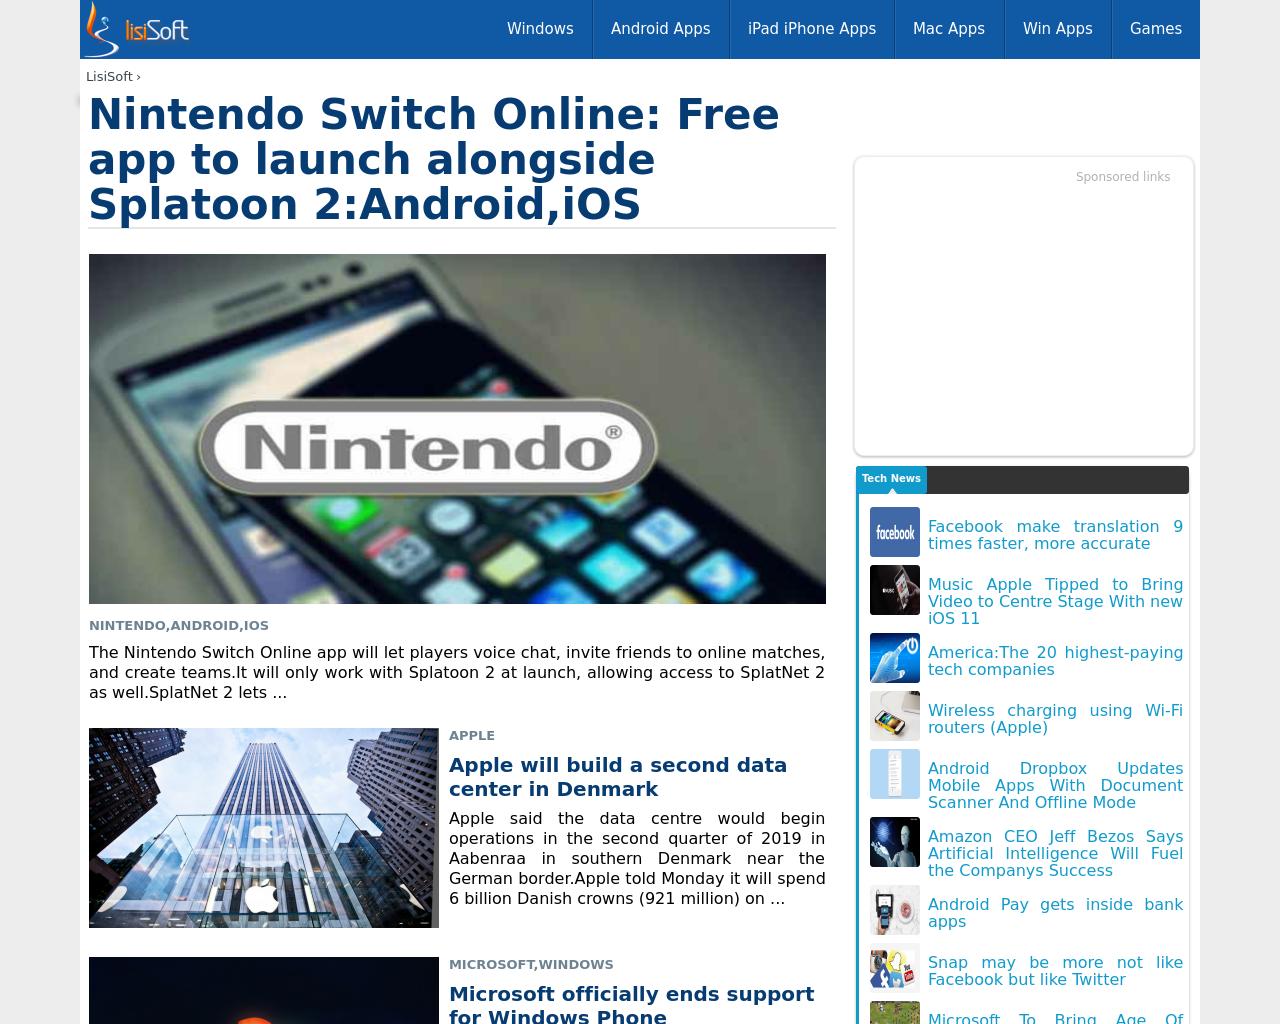 Appfinder-Lisisoft-Advertising-Reviews-Pricing